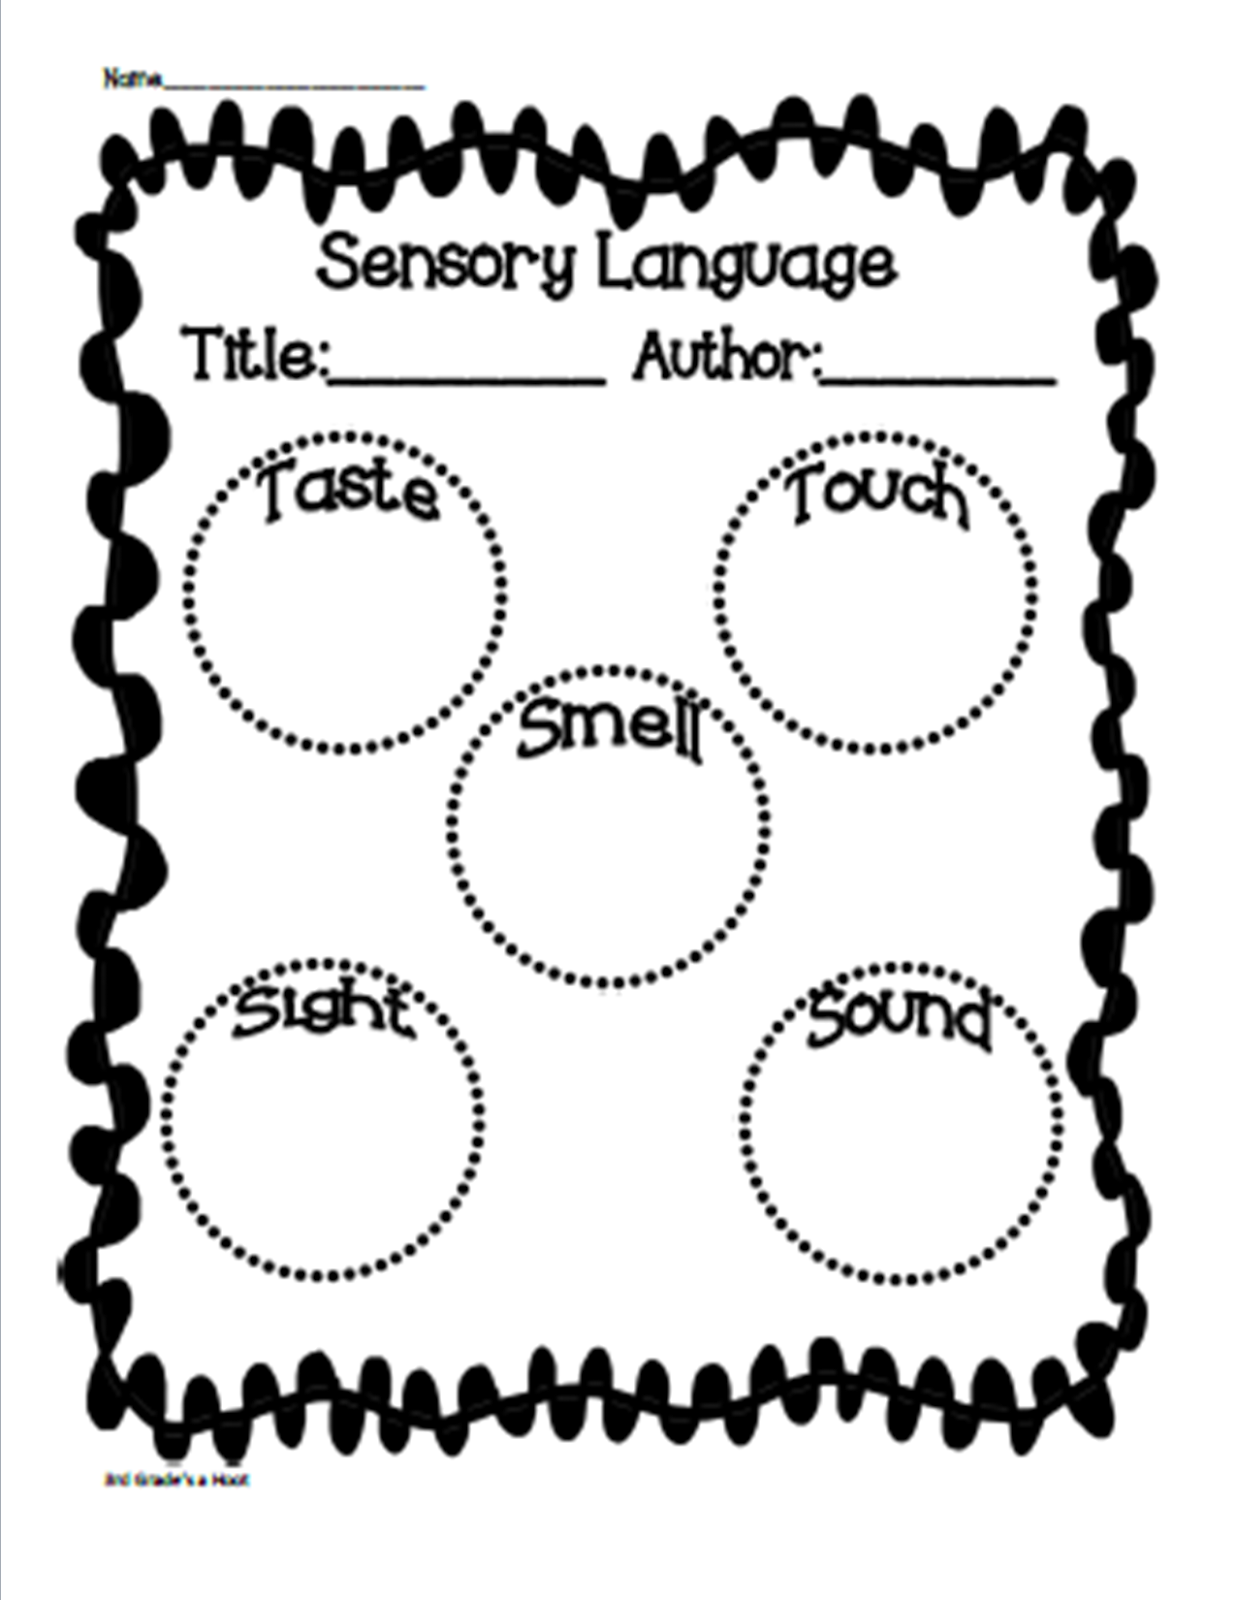 Sensory Language Freebie 3rd Grade S A Hoot